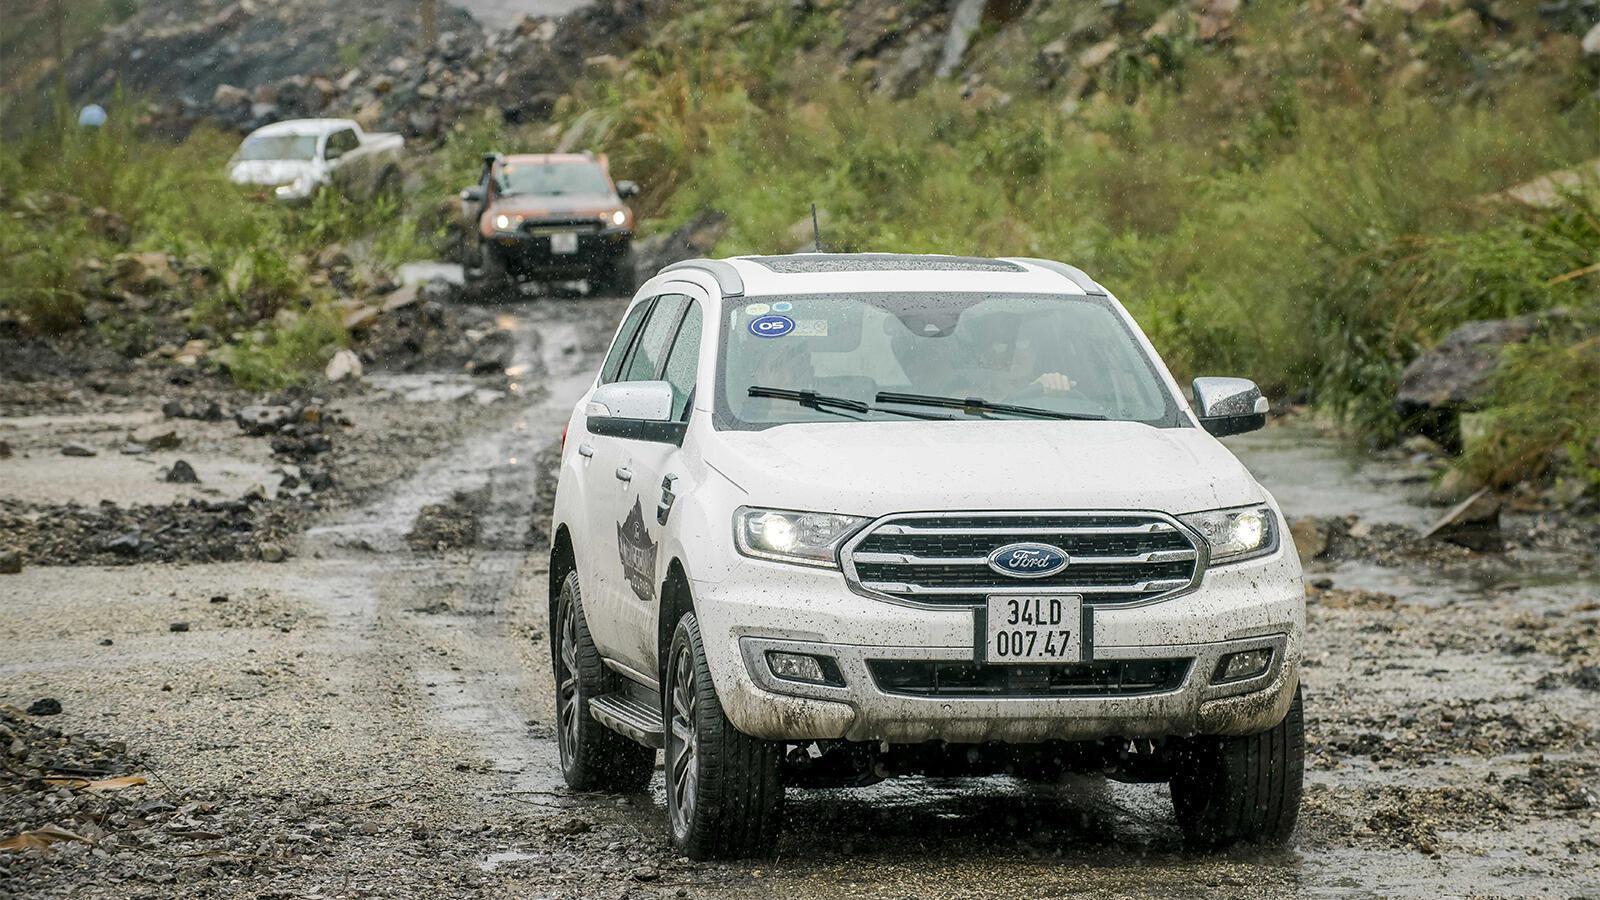 ford-extraordinary-journey-hanh-trinh-la-tren-cung-duong-quen-14.jpg